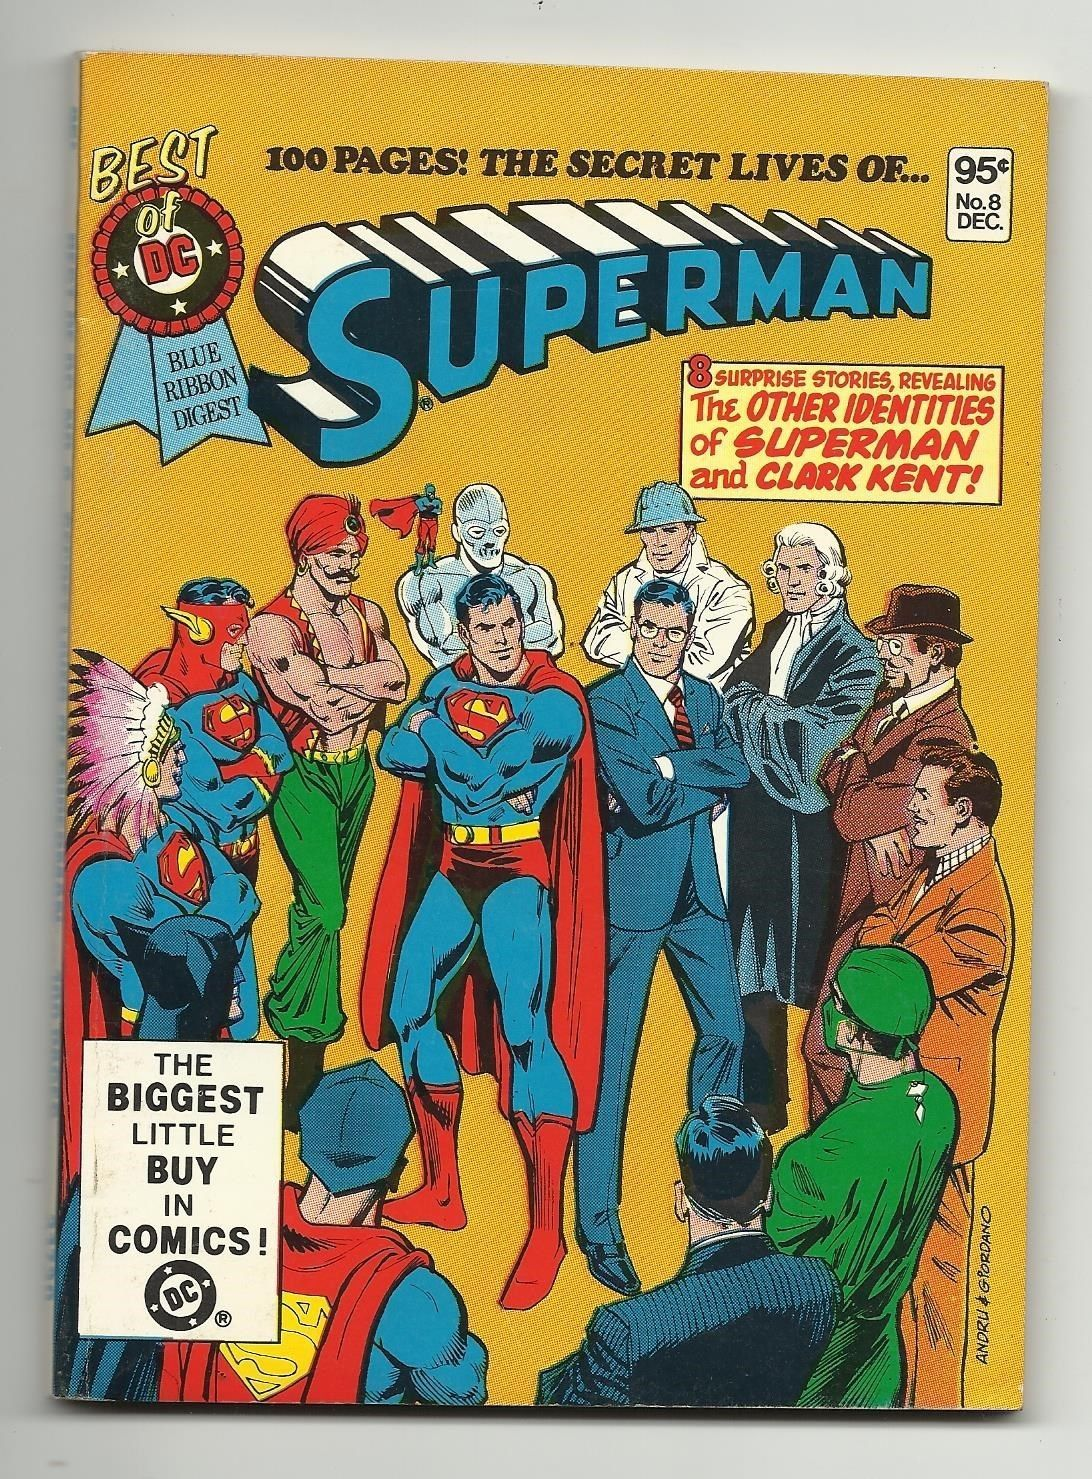 Best of DC Blue Ribbon Digest #8 - Superman Green Arrow Atom Flash Aquaman 9.0 - $10.55